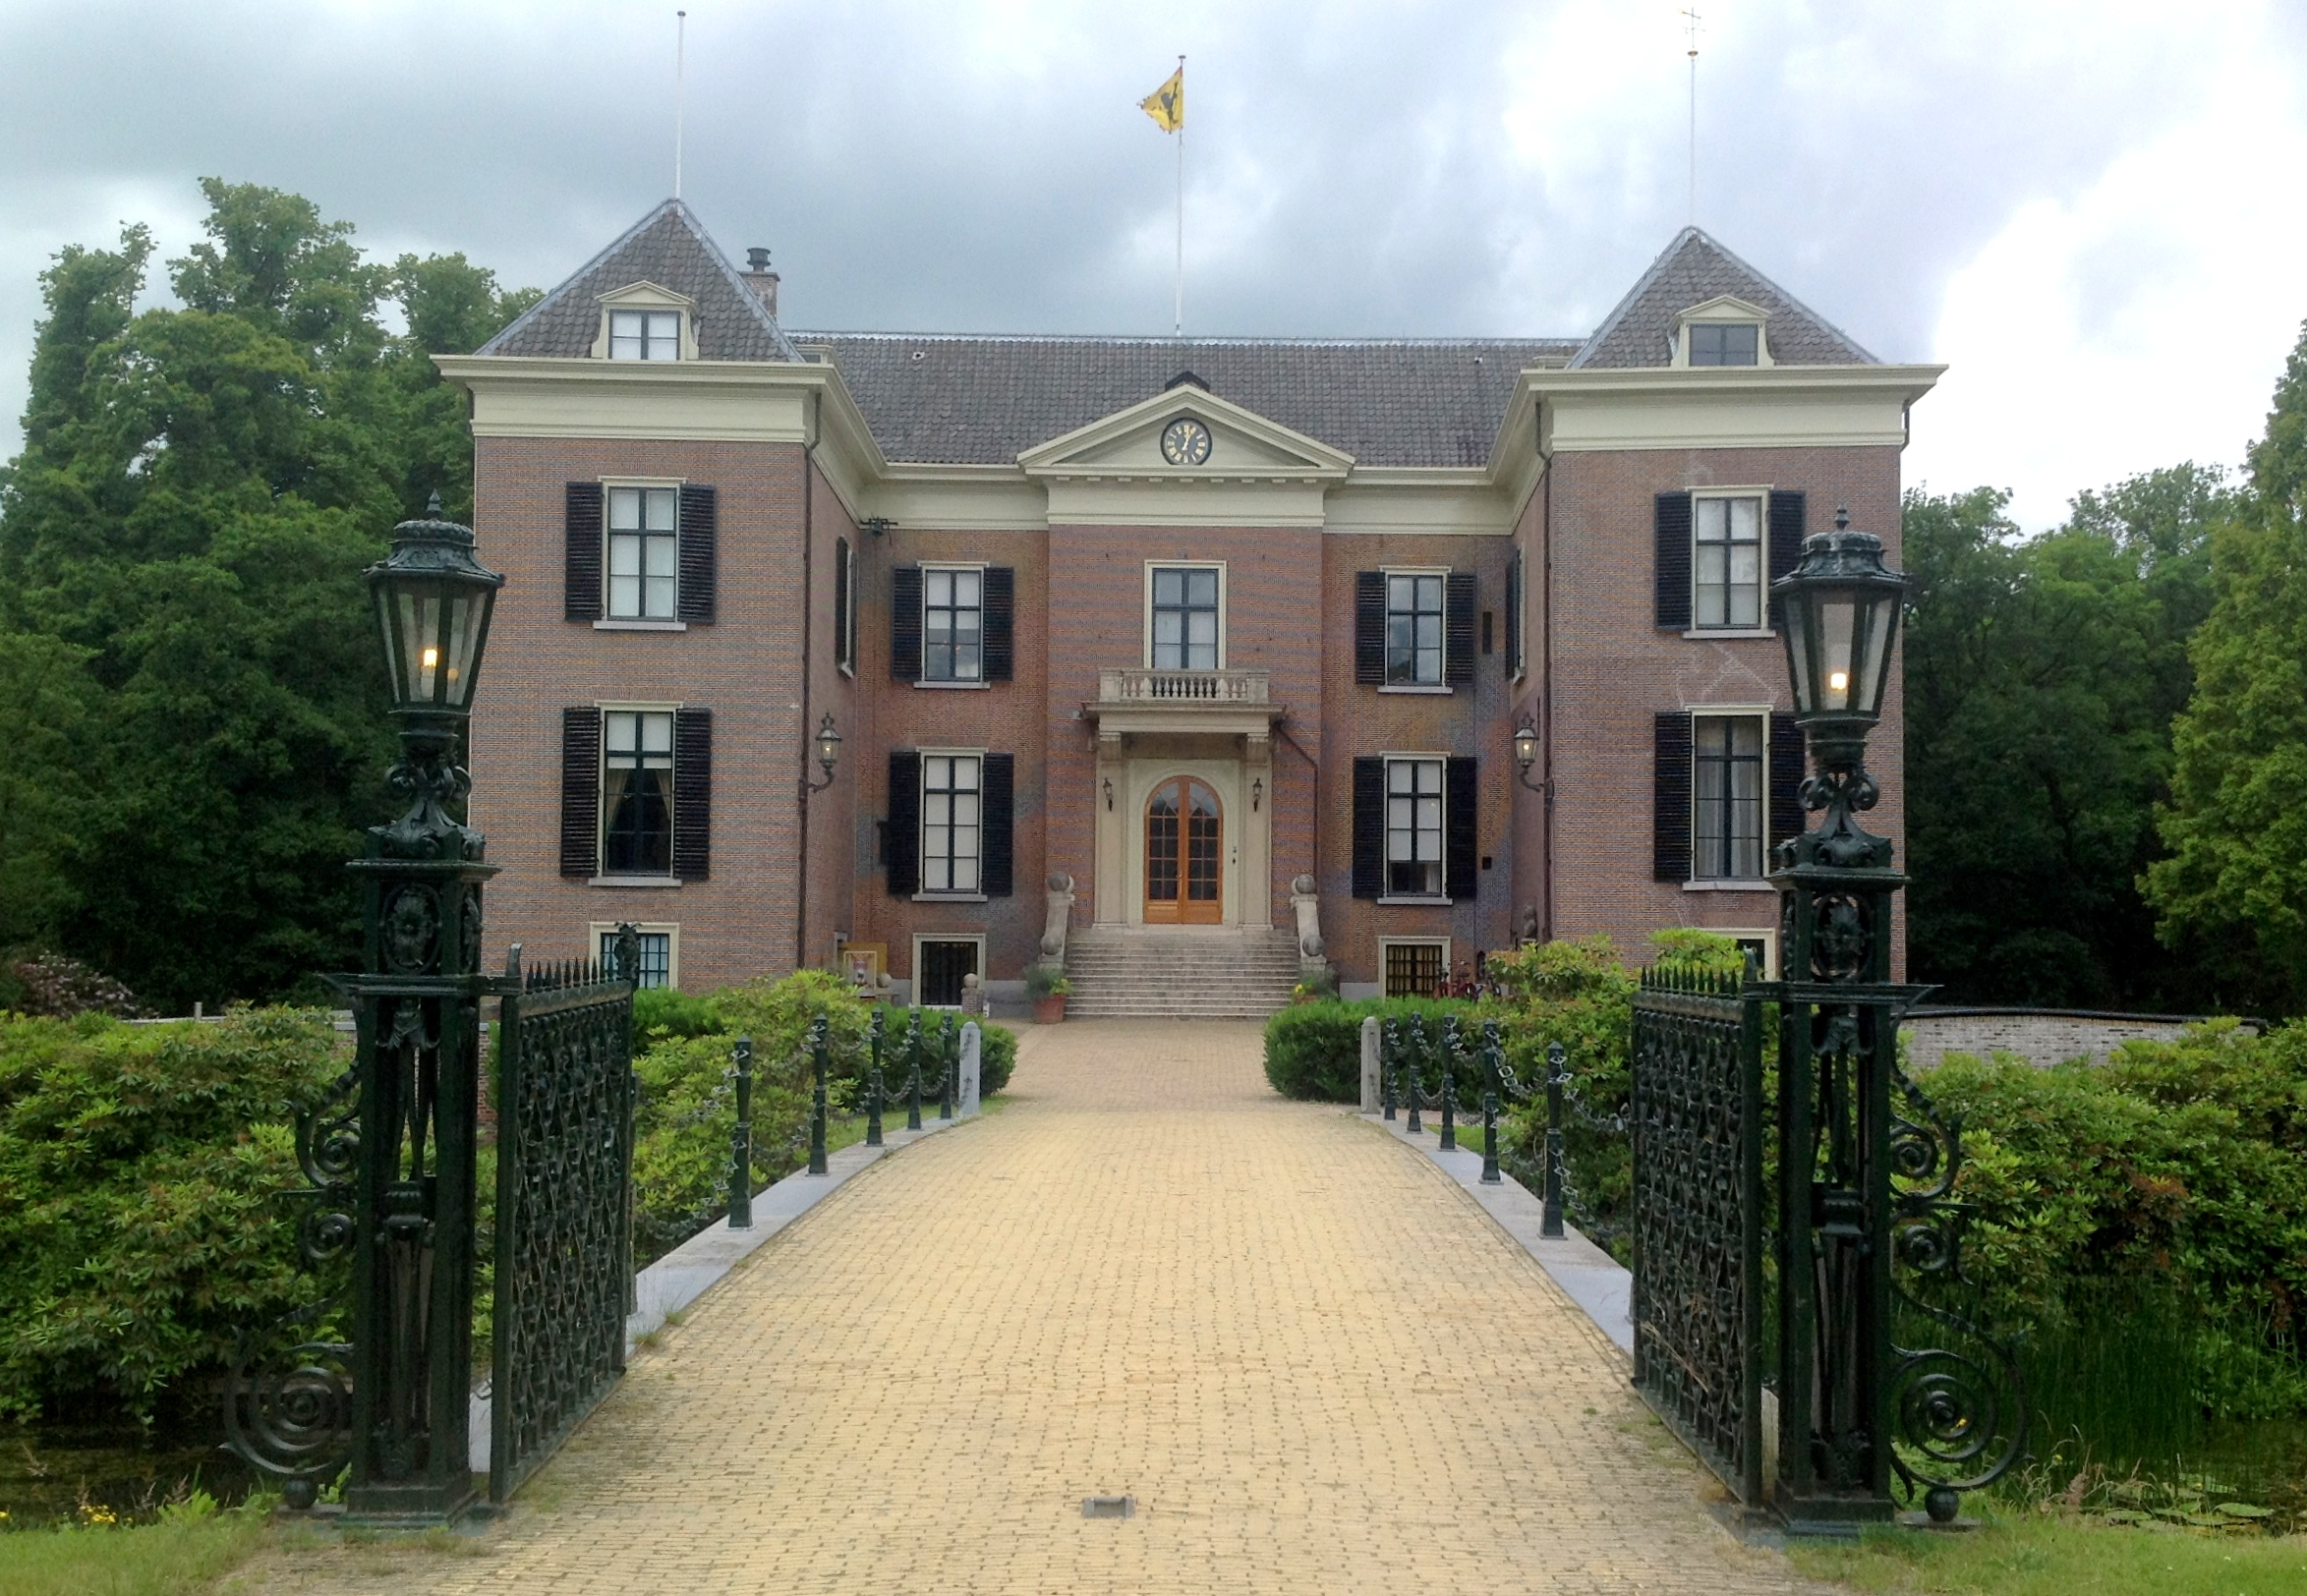 ~~~ ORGINAL~~~ POSTKARTE ~~~ Schloss Huis Den Bosch in den Niederlanden